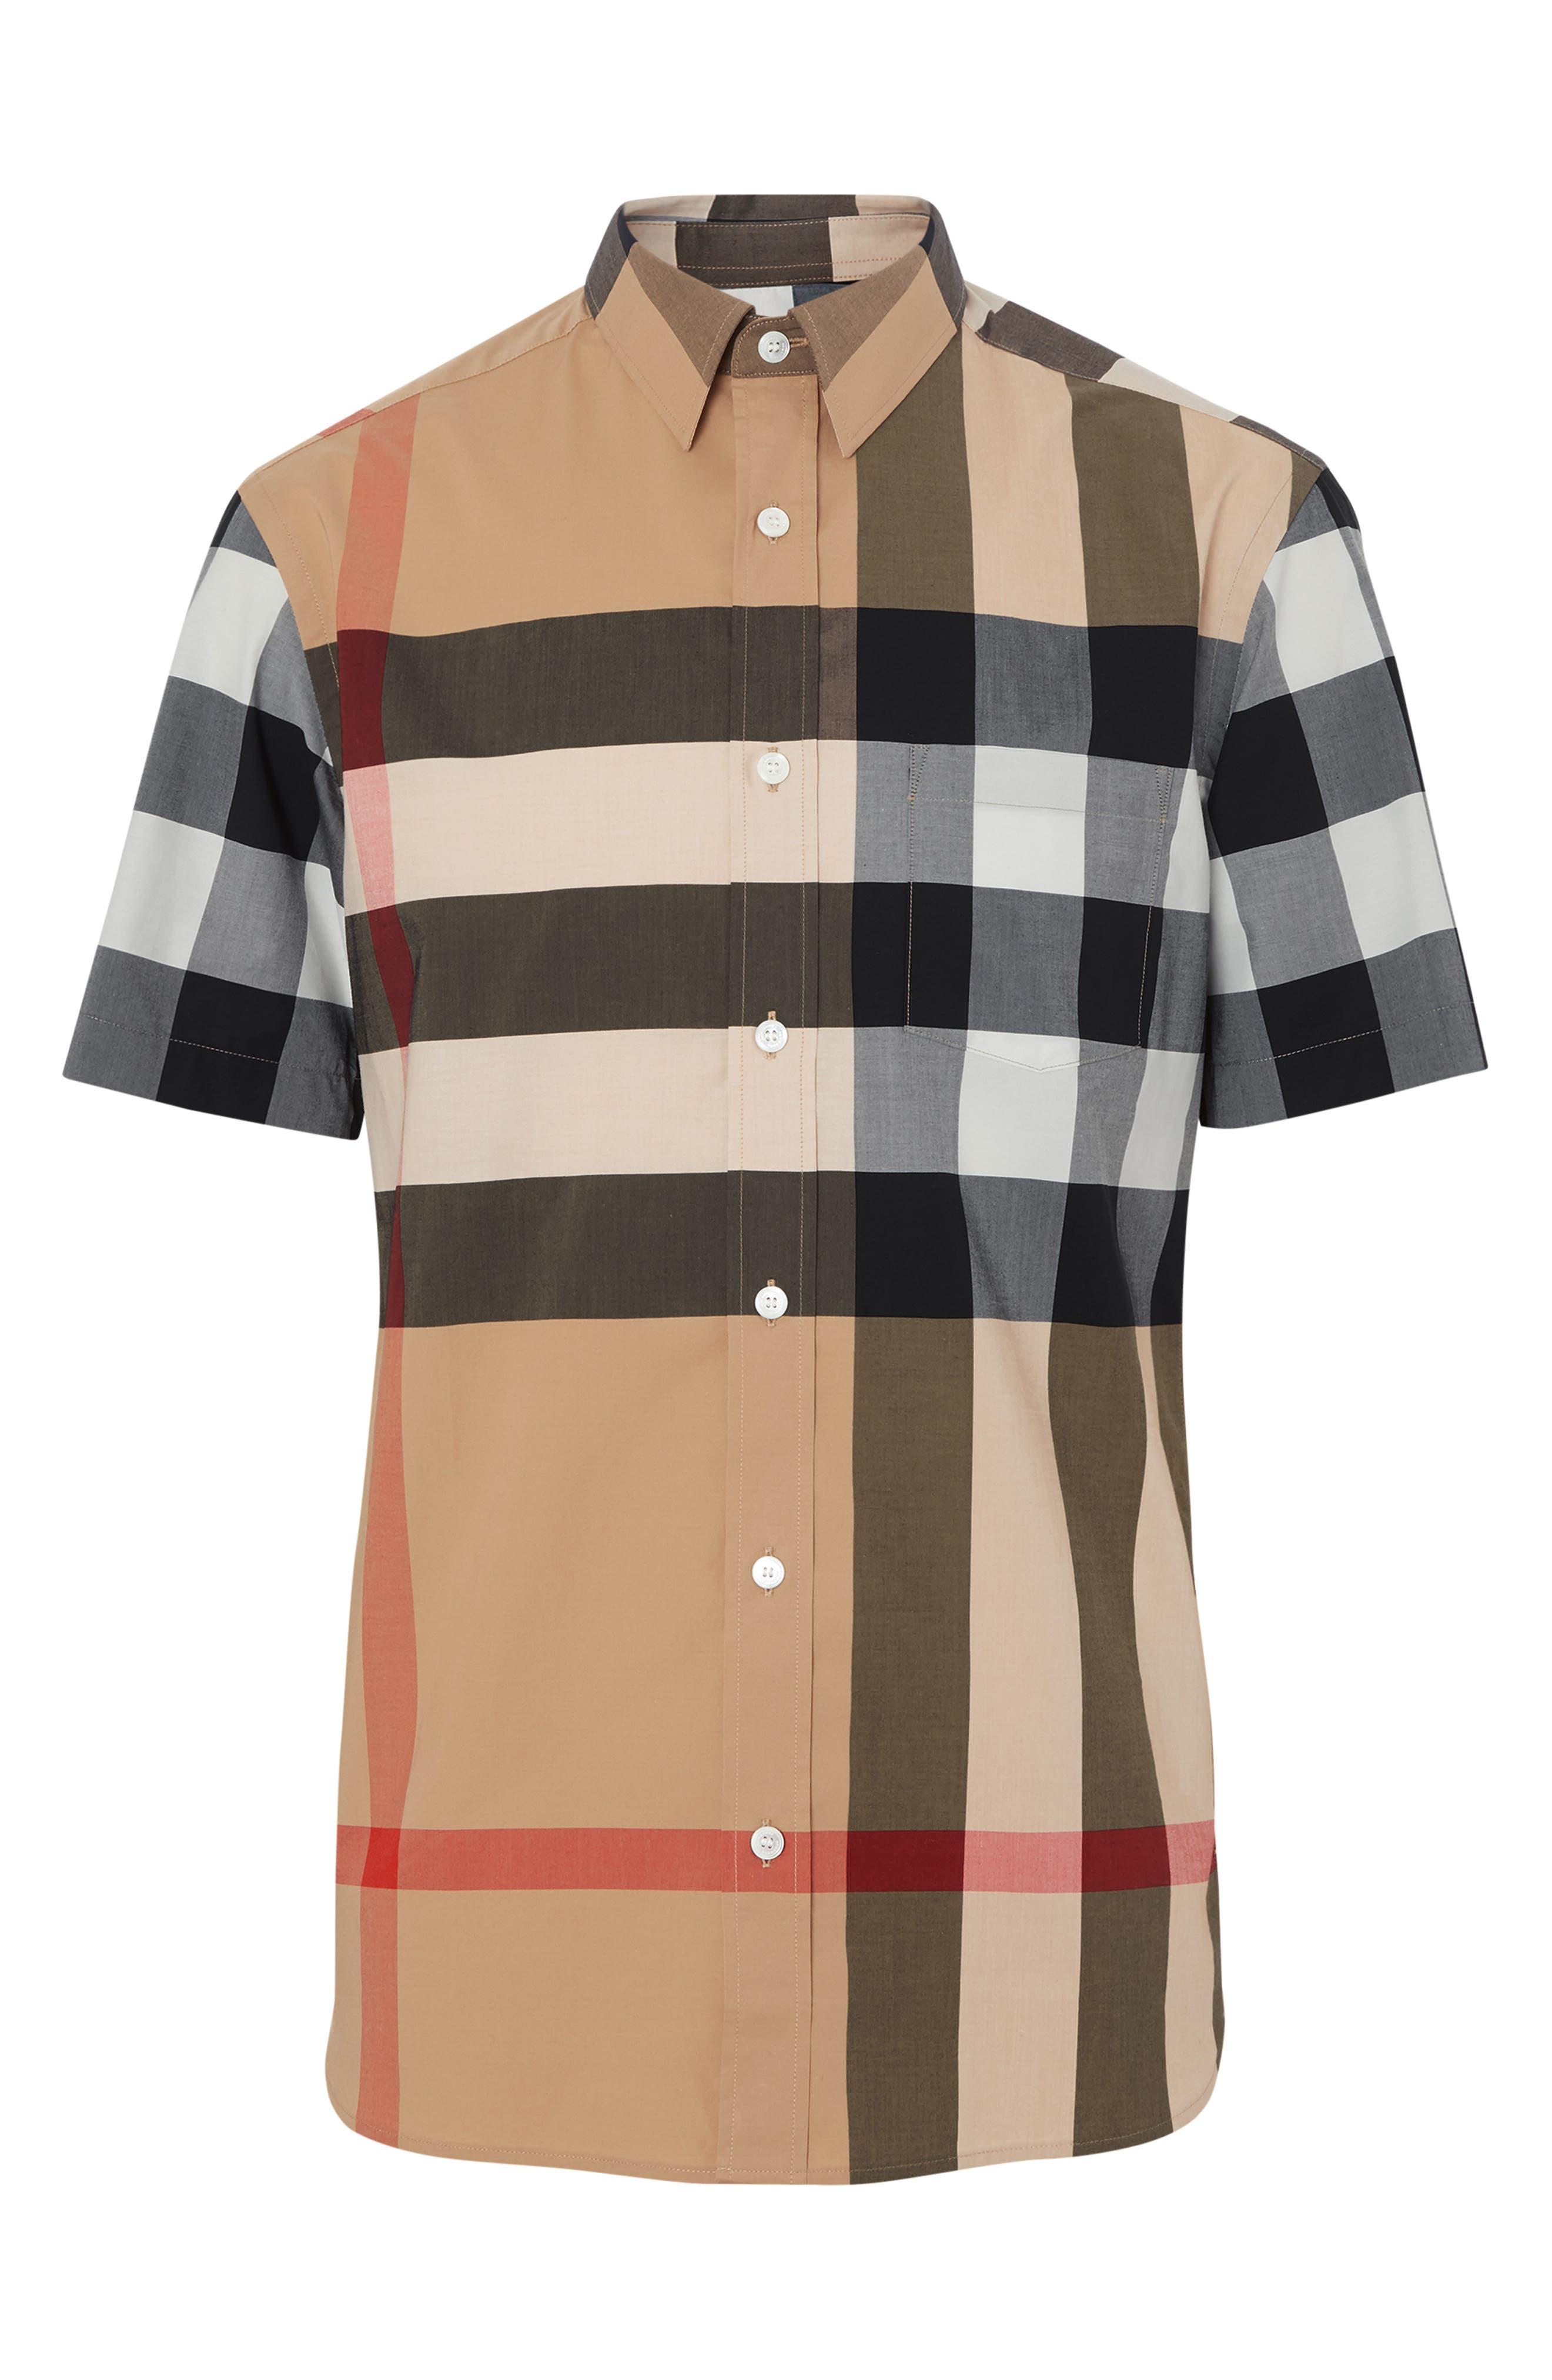 BURBERRY,                             Windsor Plaid Shirt,                             Alternate thumbnail 3, color,                             CAMEL